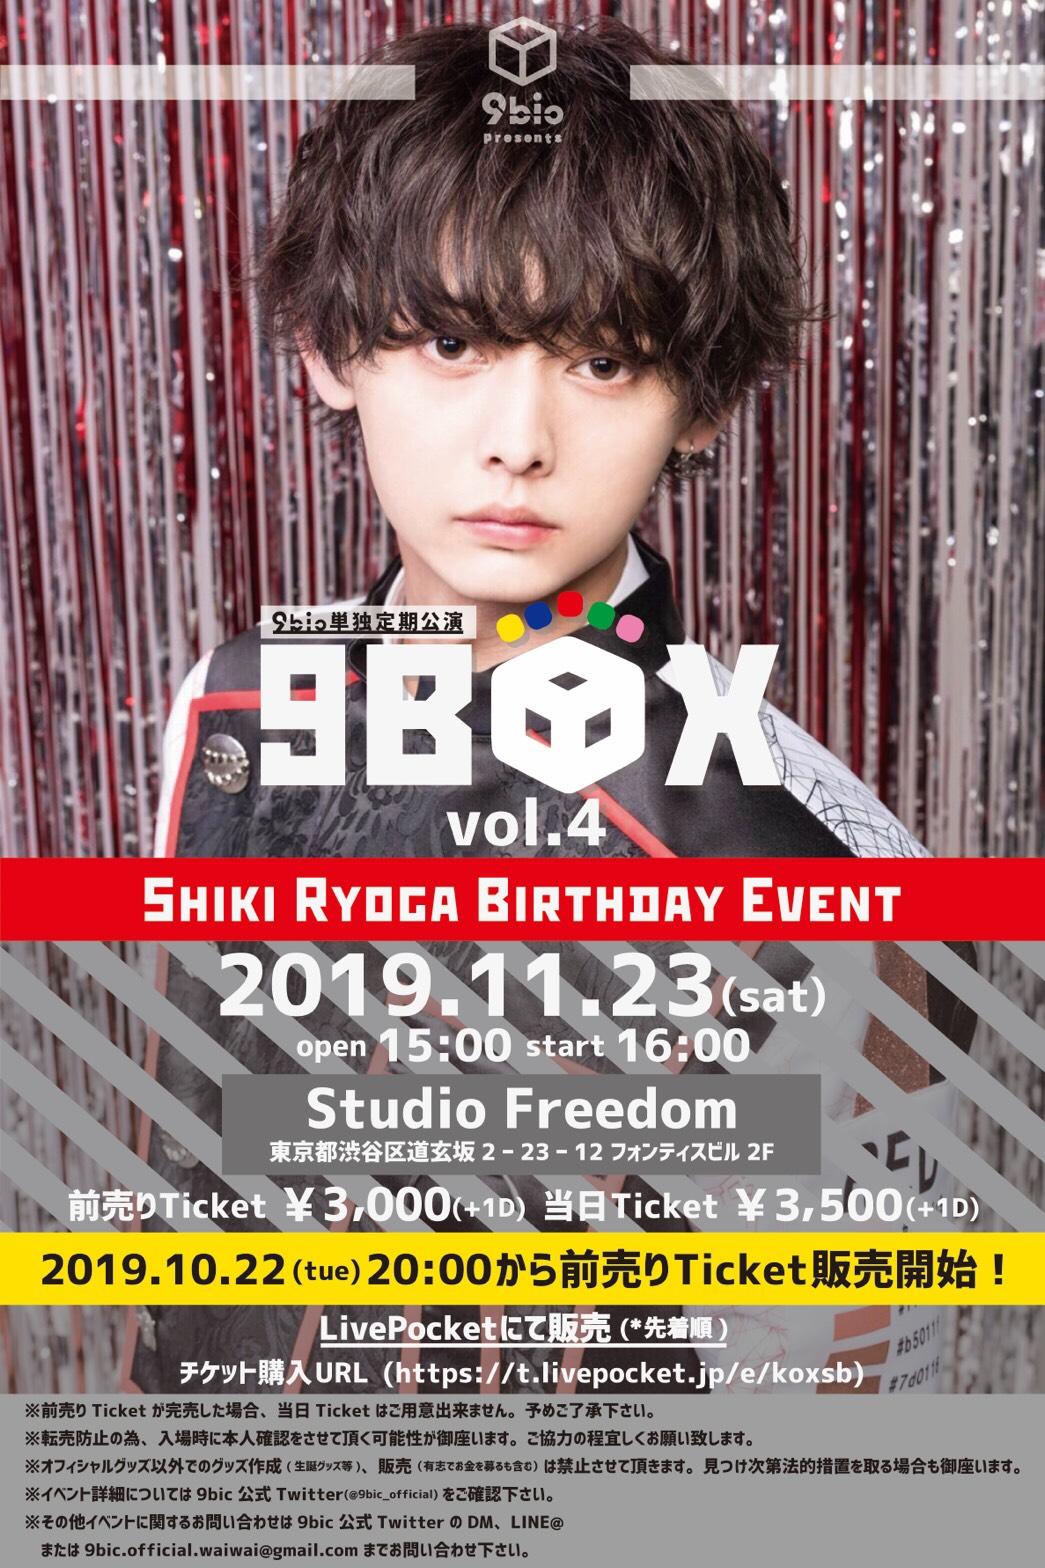 9box vol.4 ~Shiki Ryoga Birthday Event~